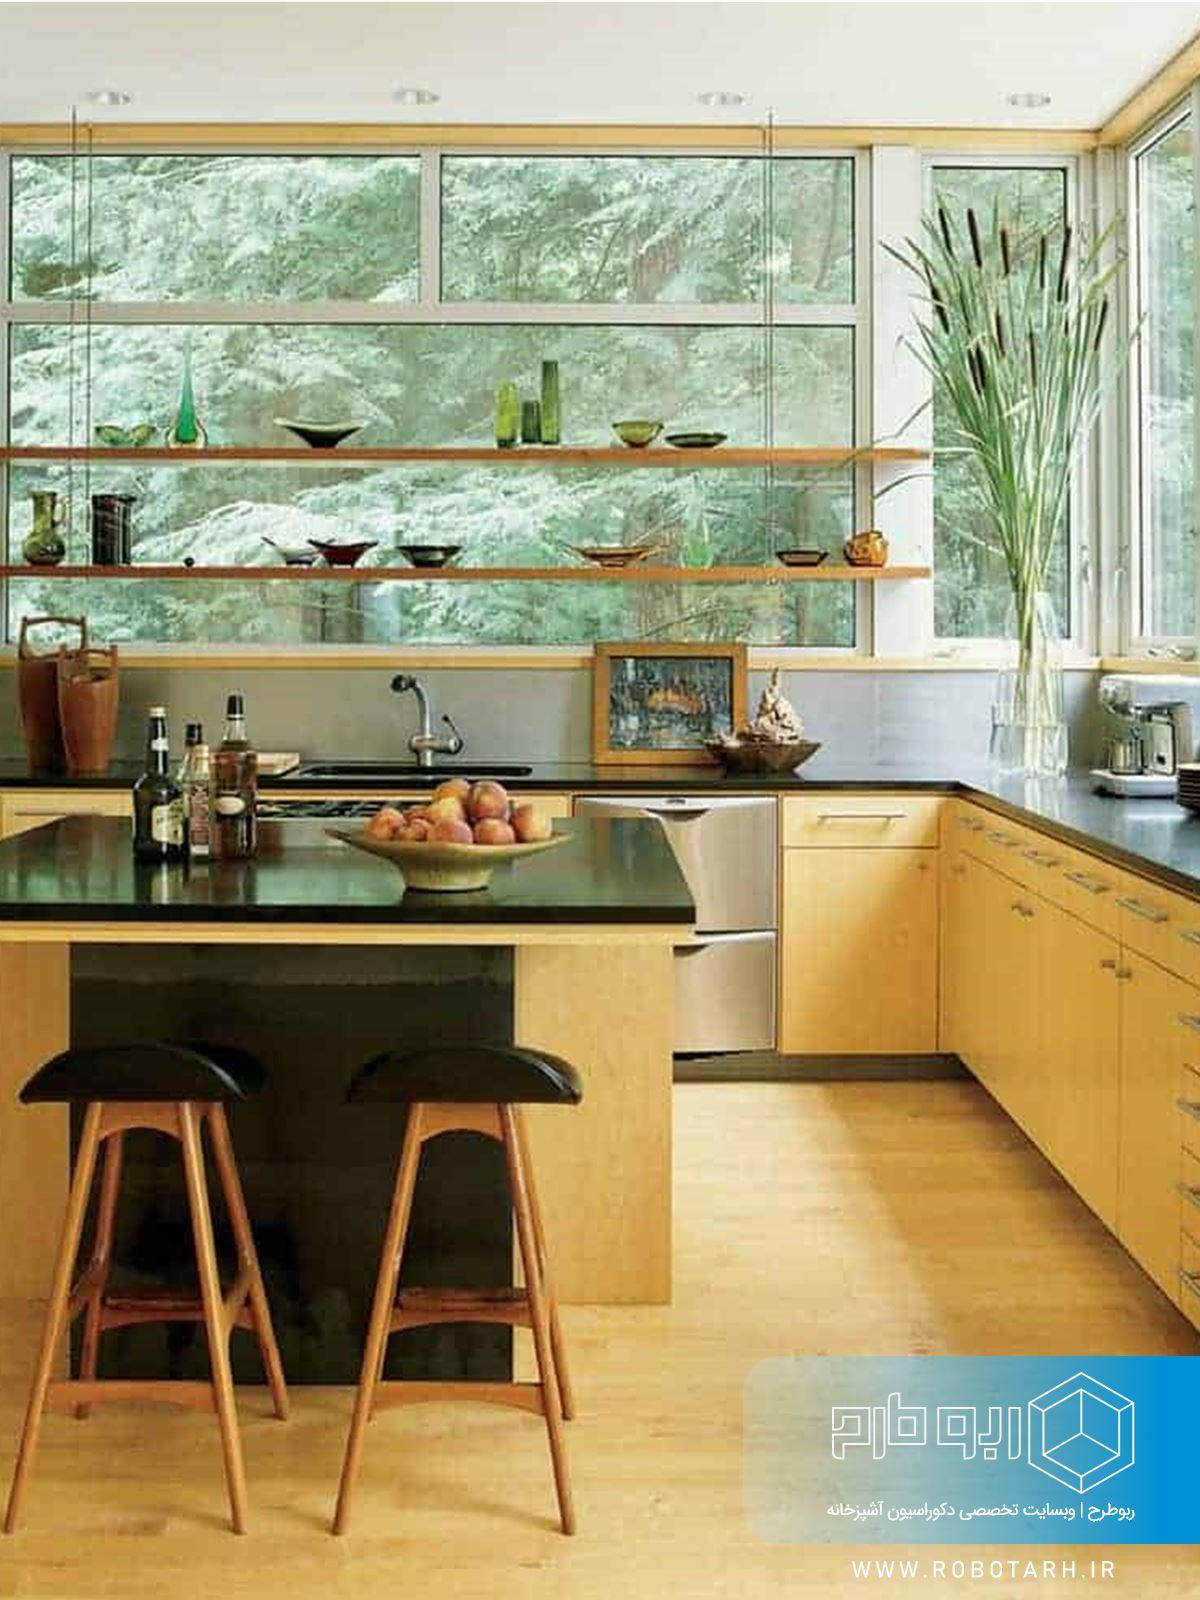 ترکیب کابینت آشپزخانه زرد و مشکی